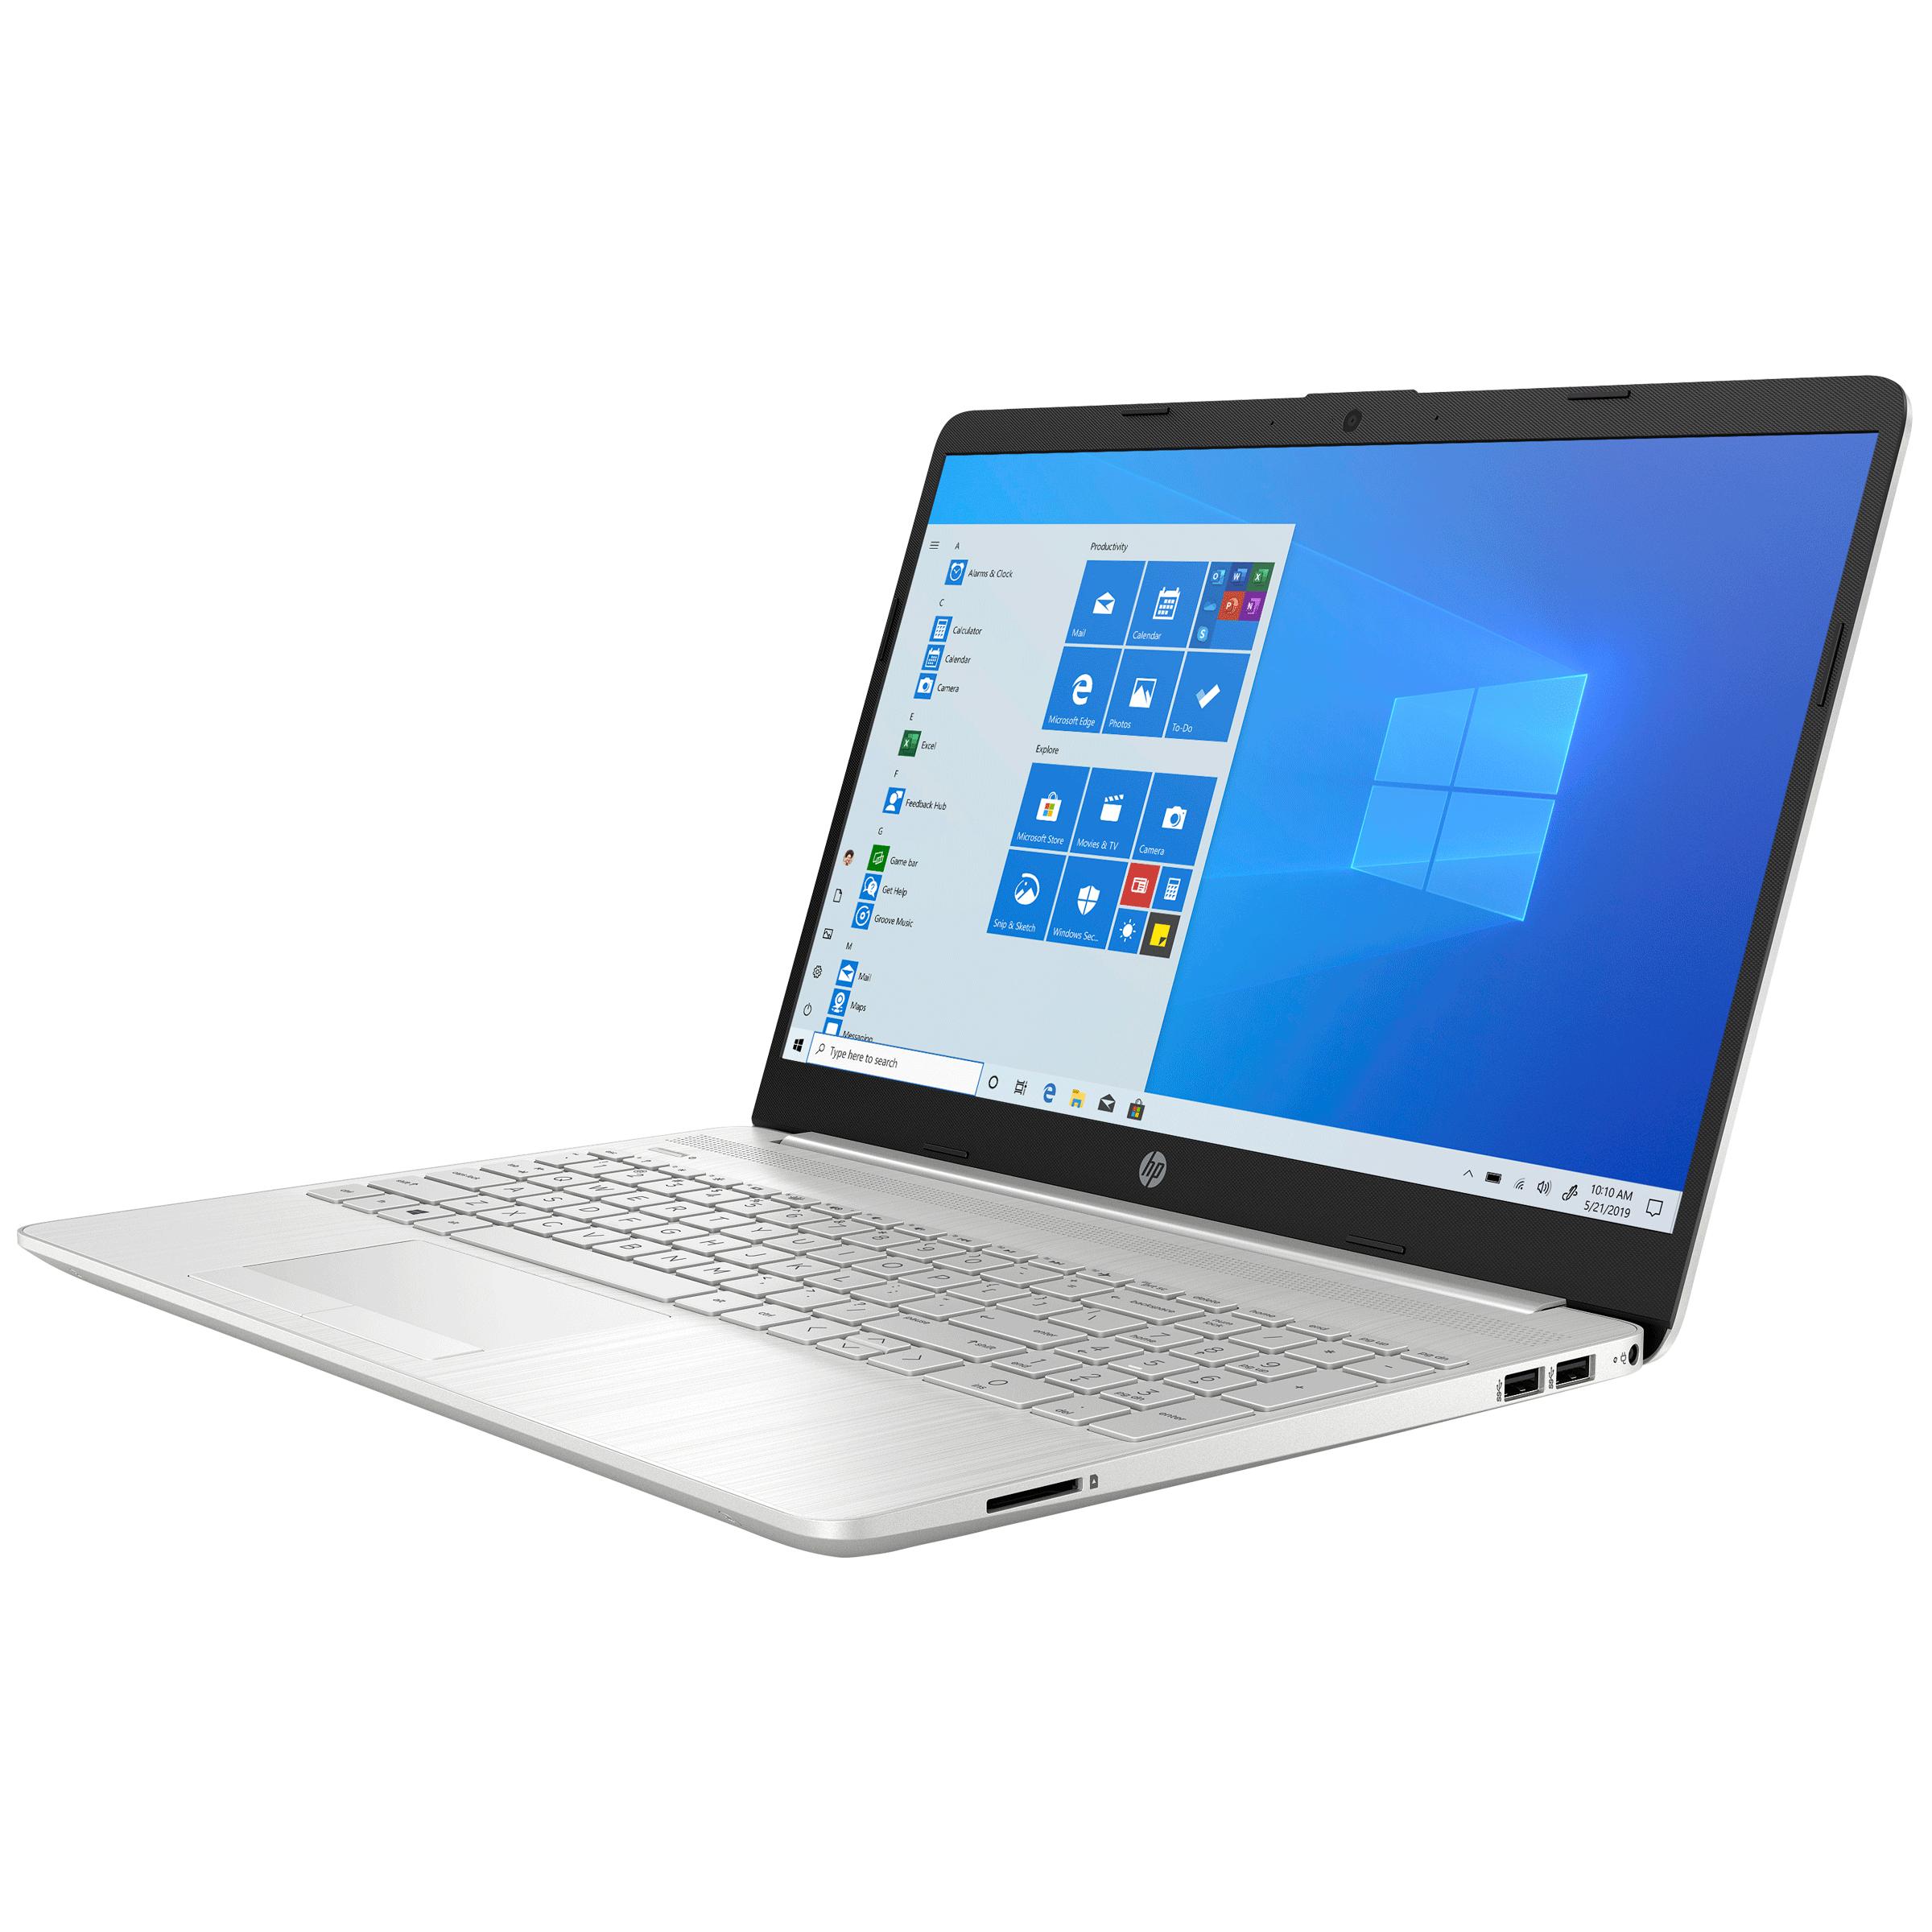 HP 15s-gr0500AU (440L7PA#ACJ) Ryzen 5 Windows 10 Home Laptop (8GB RAM, 512GB SSD, AMD Radeon Vega 8 Graphics, MS Office, 39.62cm, Natural Silver) 3